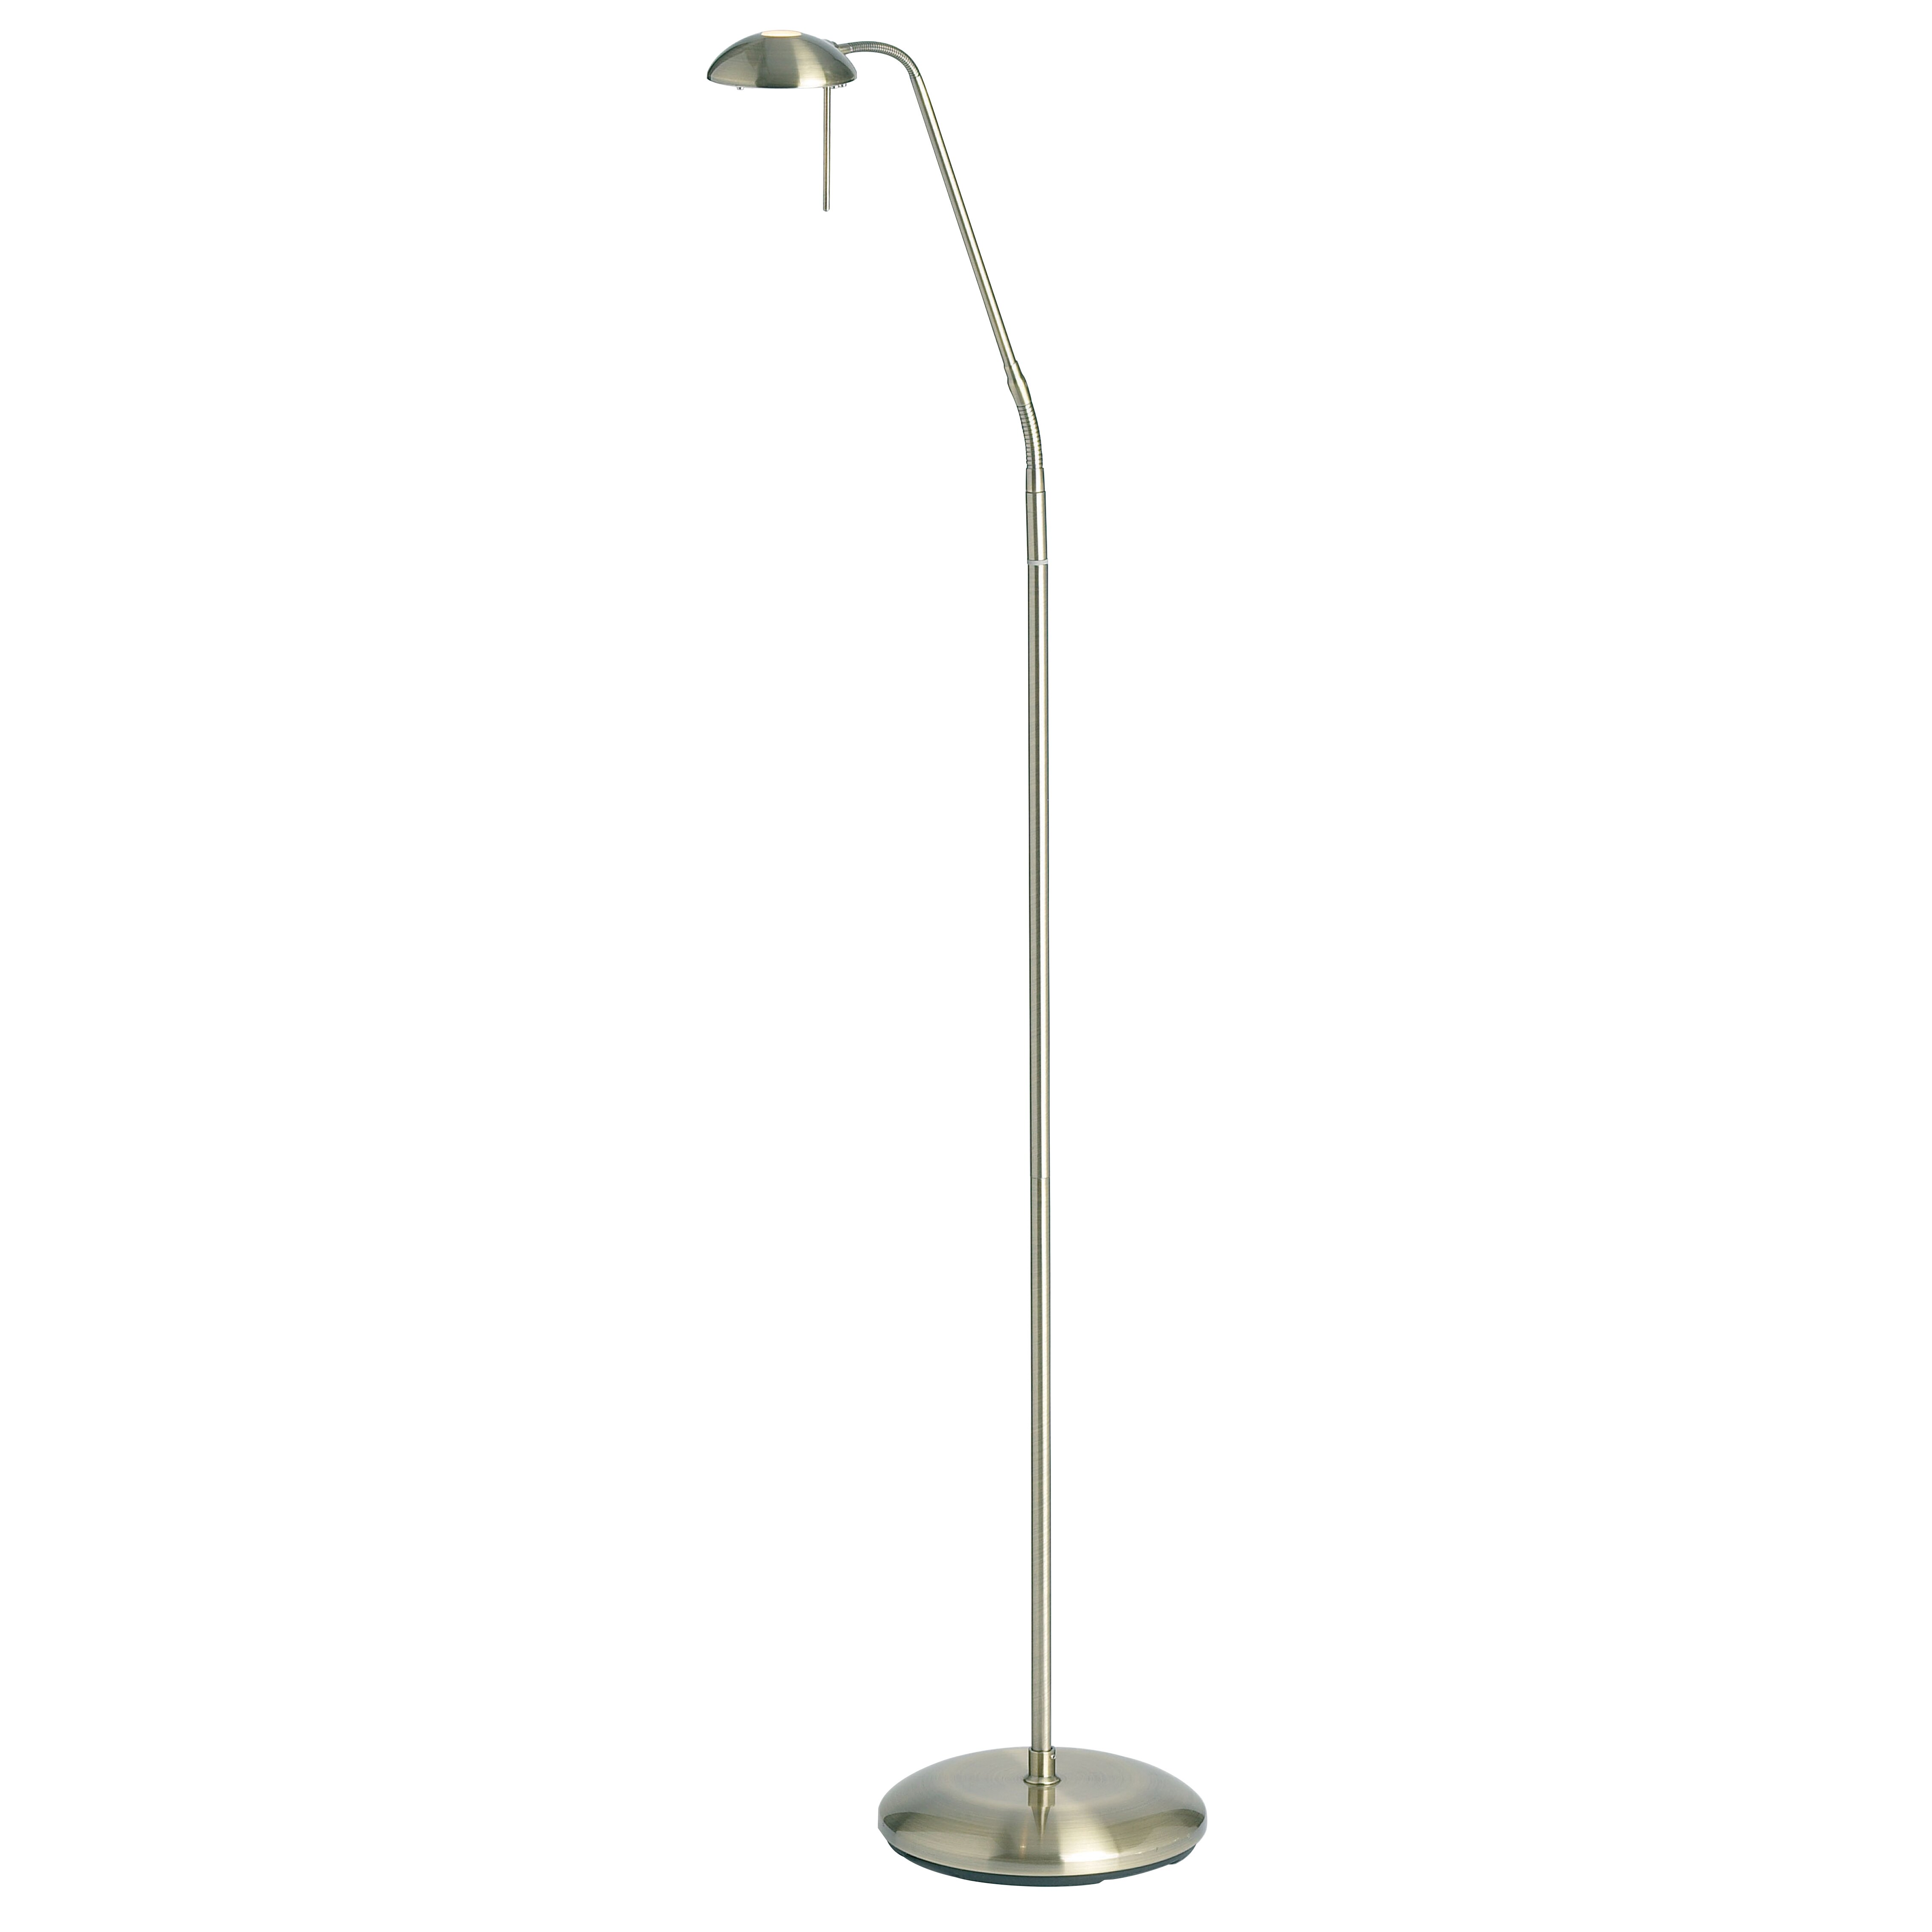 endon lighting 656 159cm reading floor lamp reviews wayfair uk. Black Bedroom Furniture Sets. Home Design Ideas